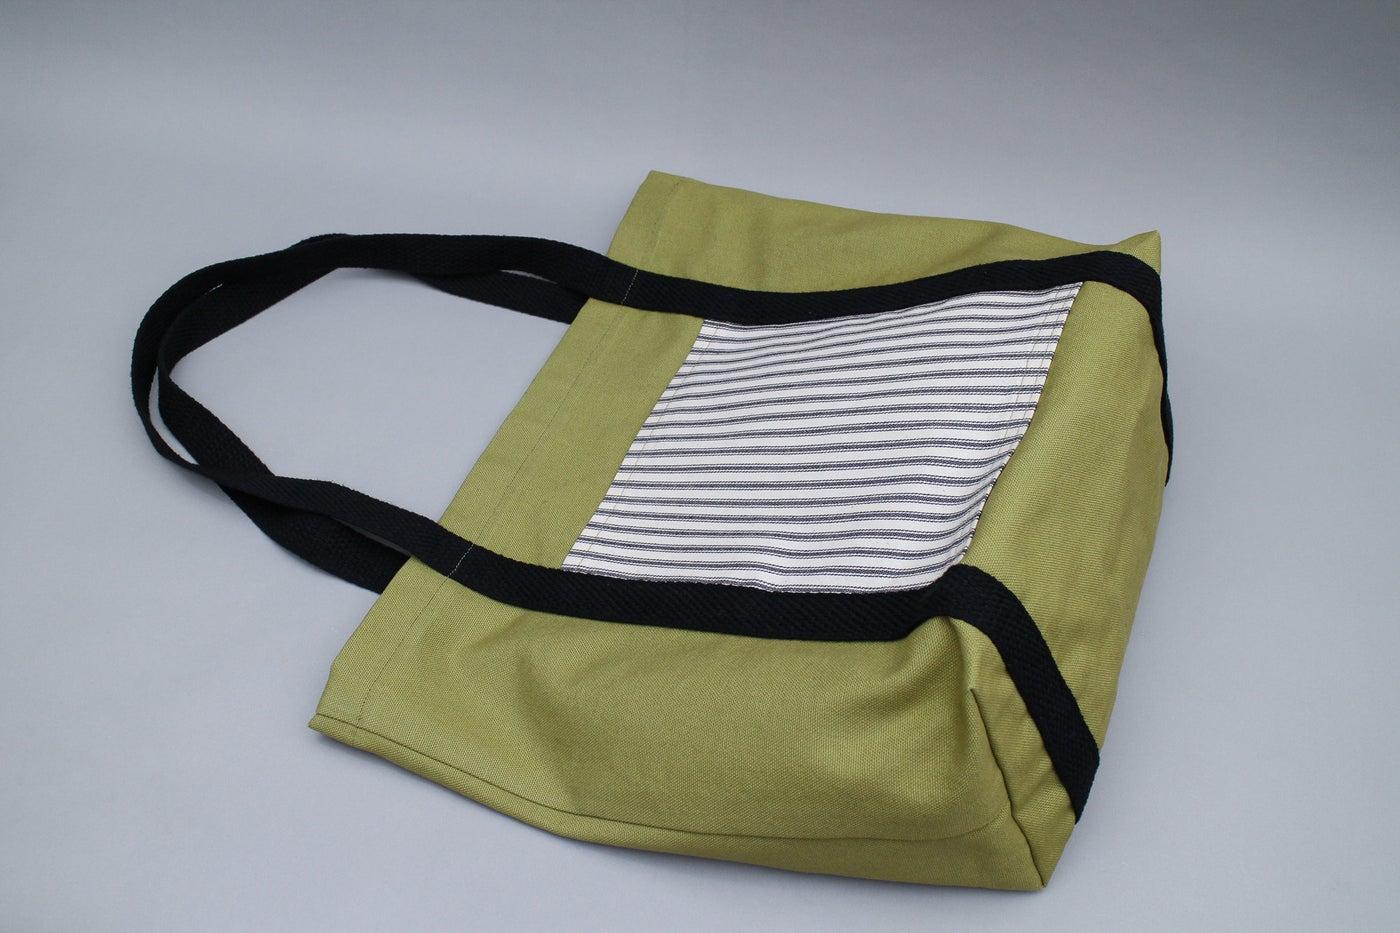 sewing covers-17.jpg